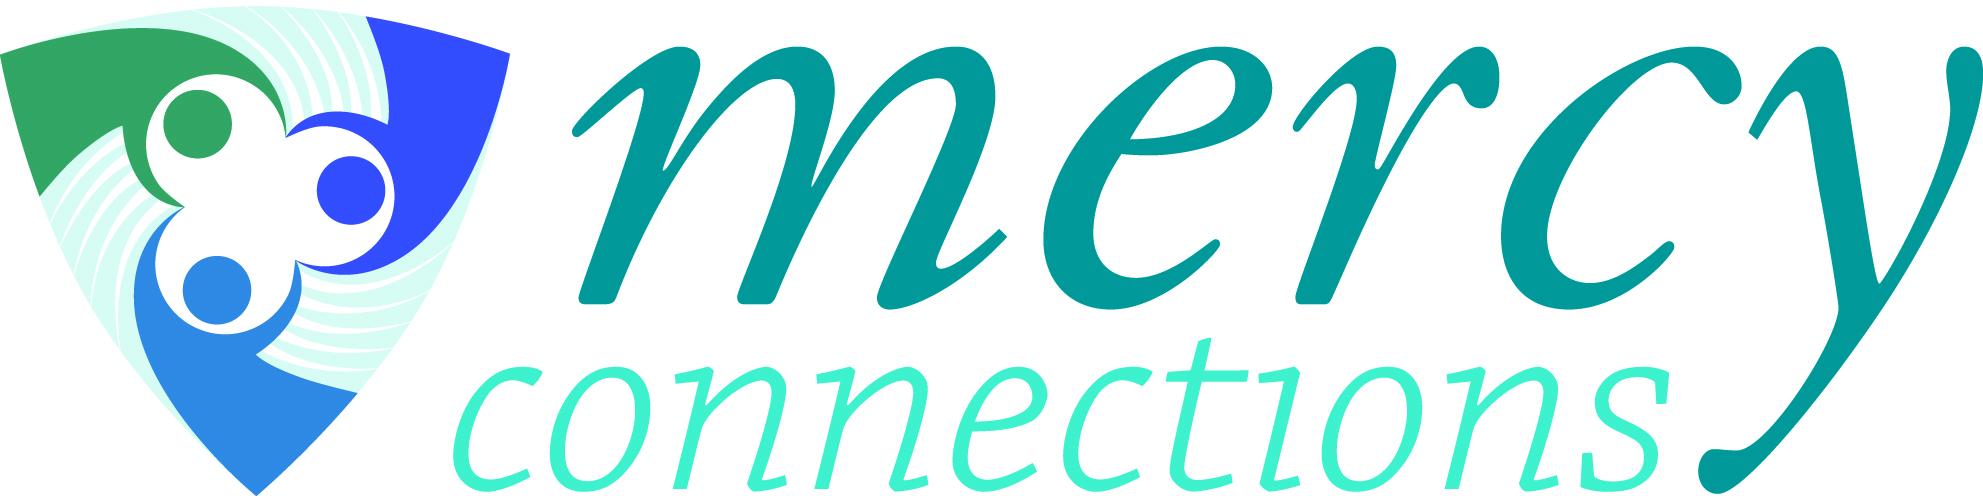 7tcnbeizqvynnar3vfcm+mercy_connections